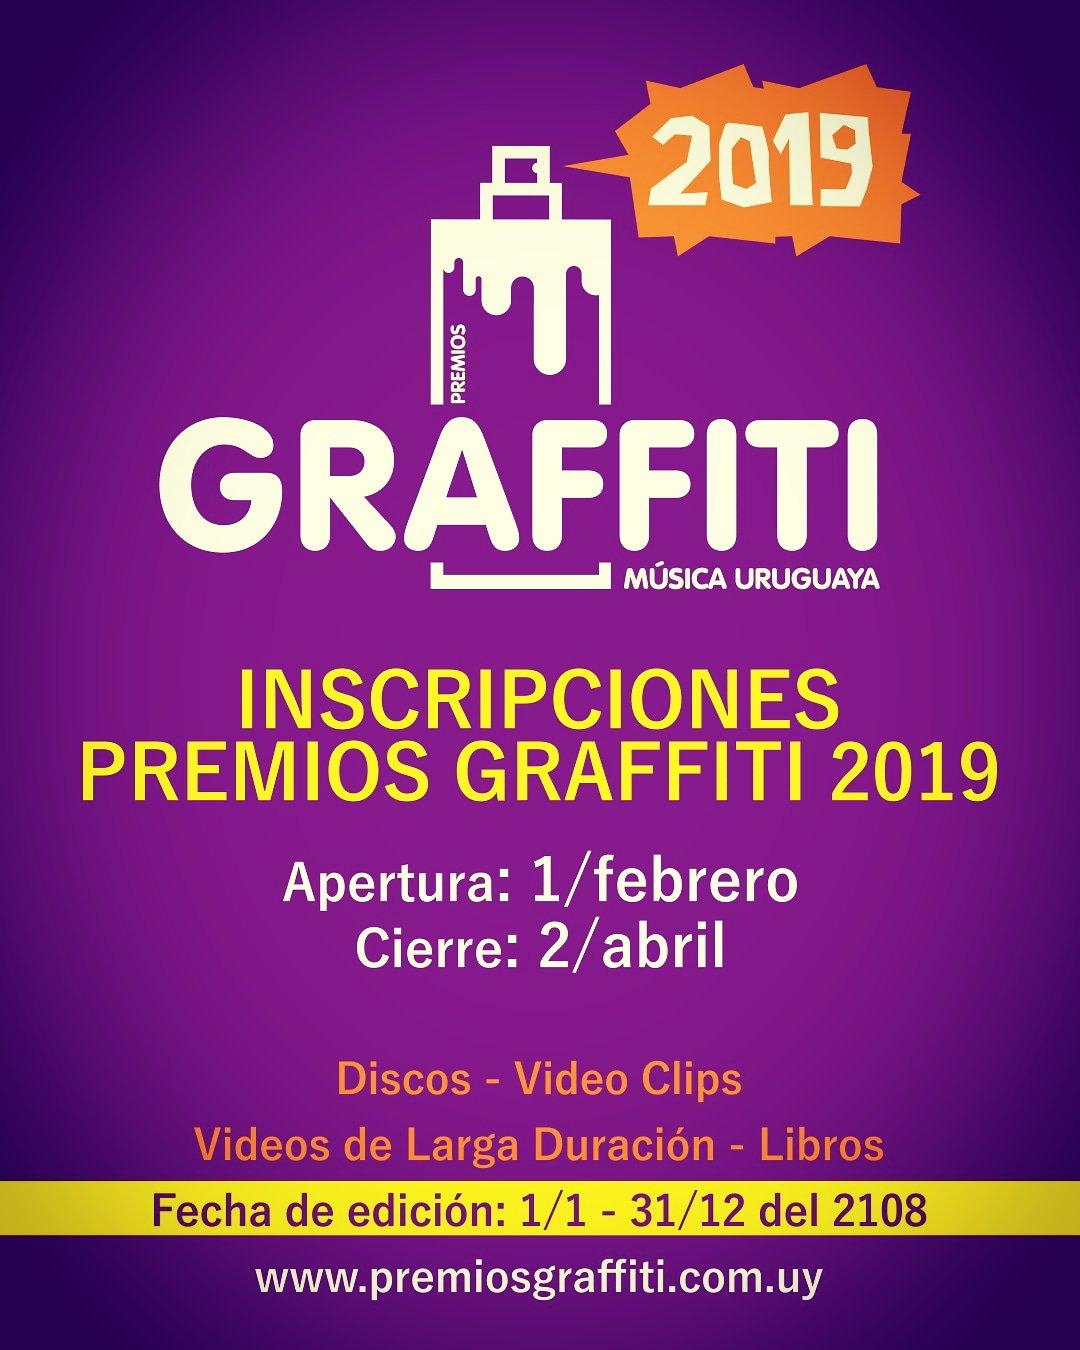 Premios Graffiti 2019